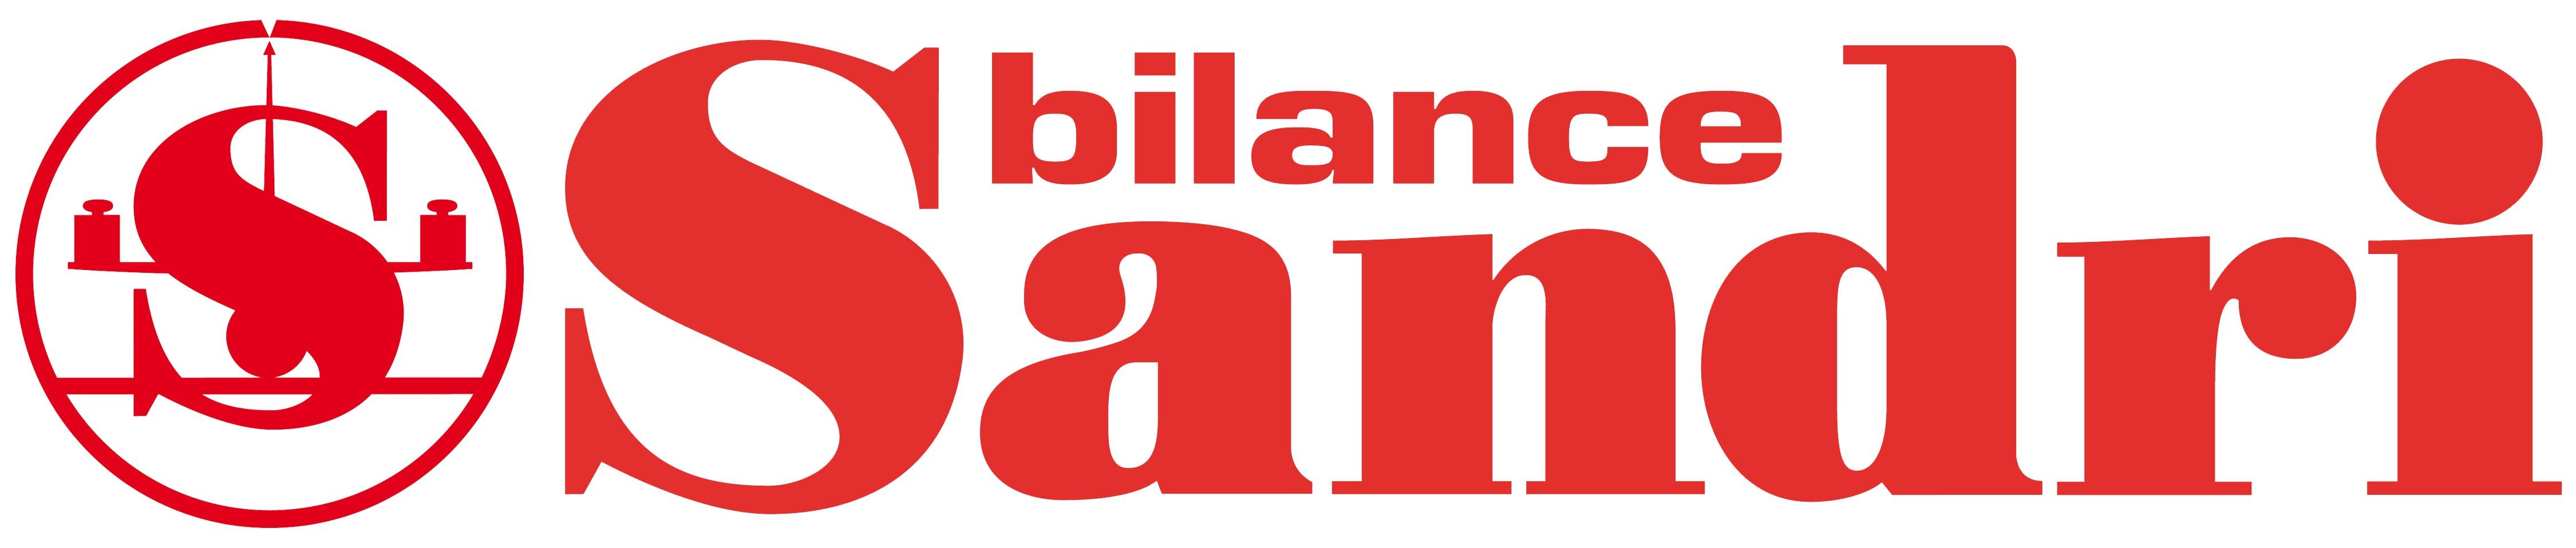 logo_sandri bilance srl: pese a ponte